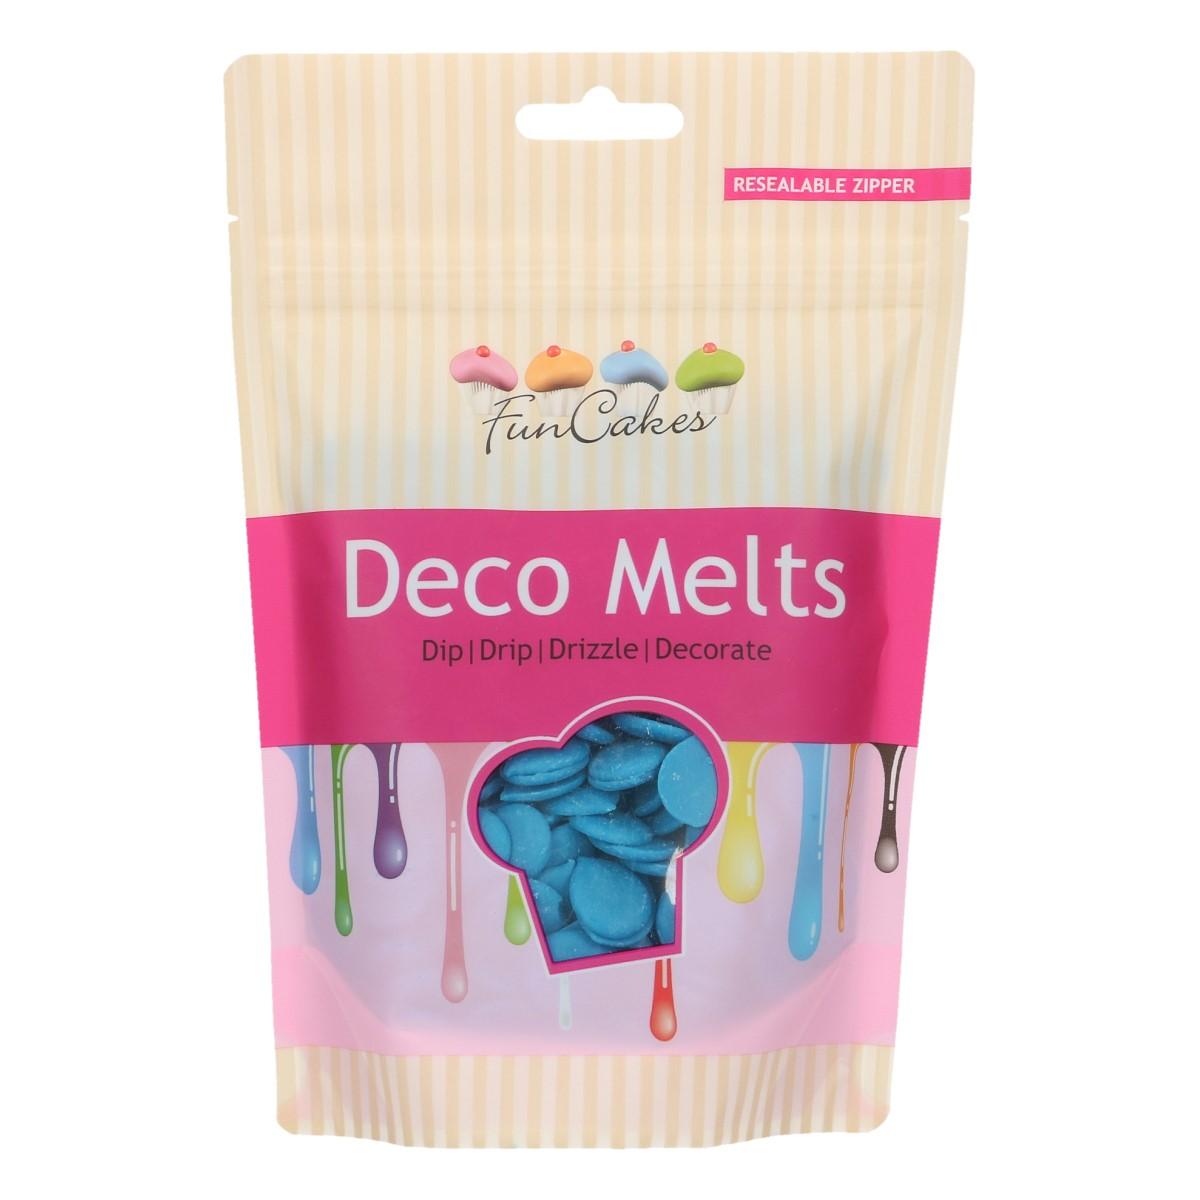 Imagen de producto: https://tienda.postreadiccion.com/img/articulos/secundarias12795-deco-melts-azules-250-g-funcakes-2.jpg